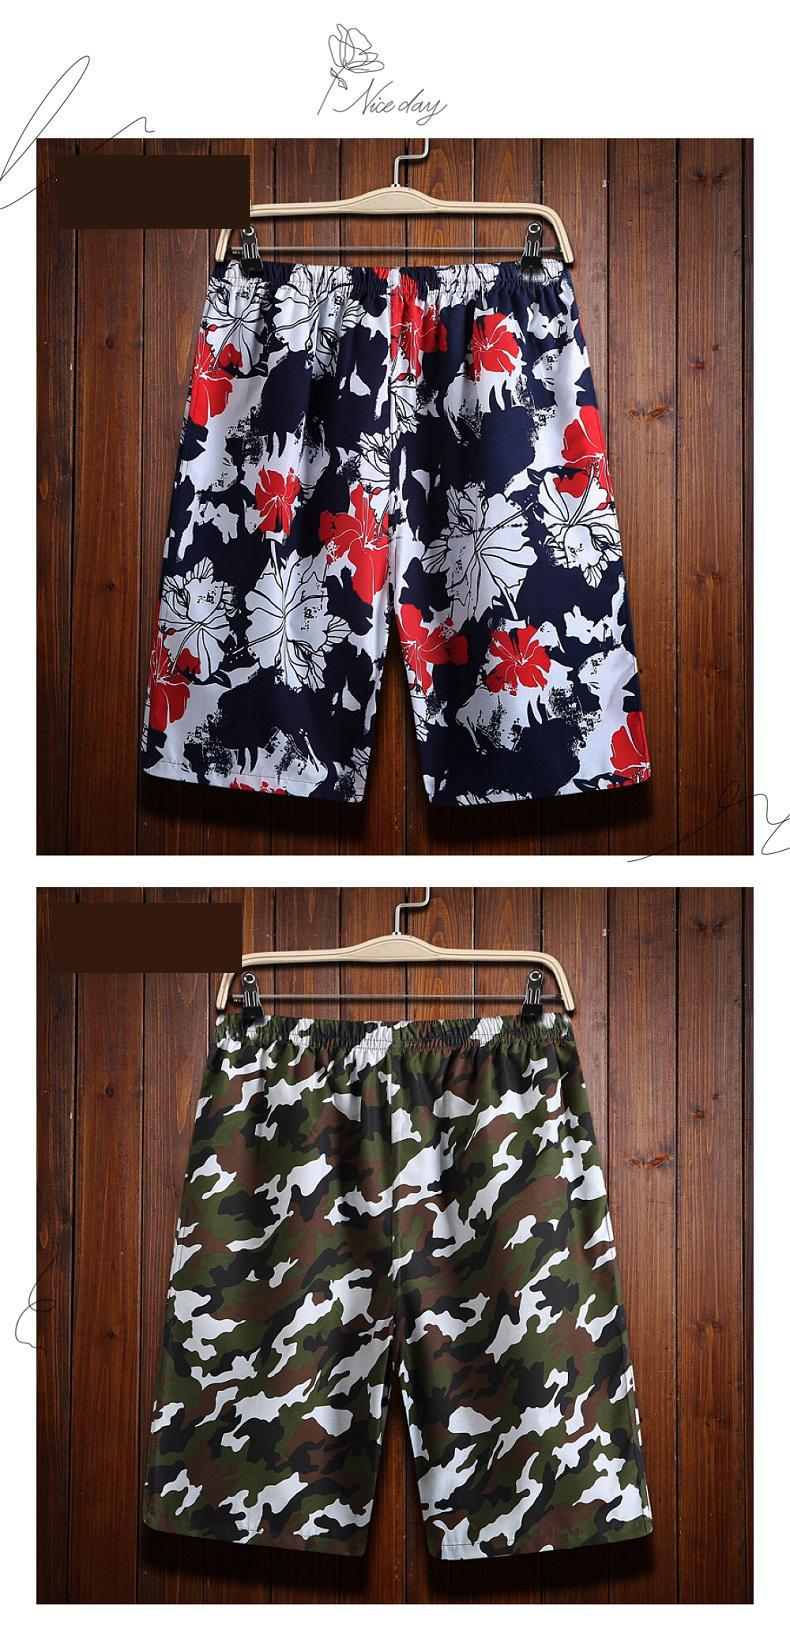 10 Patterns Camouflage Compression Shorts Men Summer Clothing Board Shorts Nylon Bottom Men Side Pockets Men's Swimwear 4